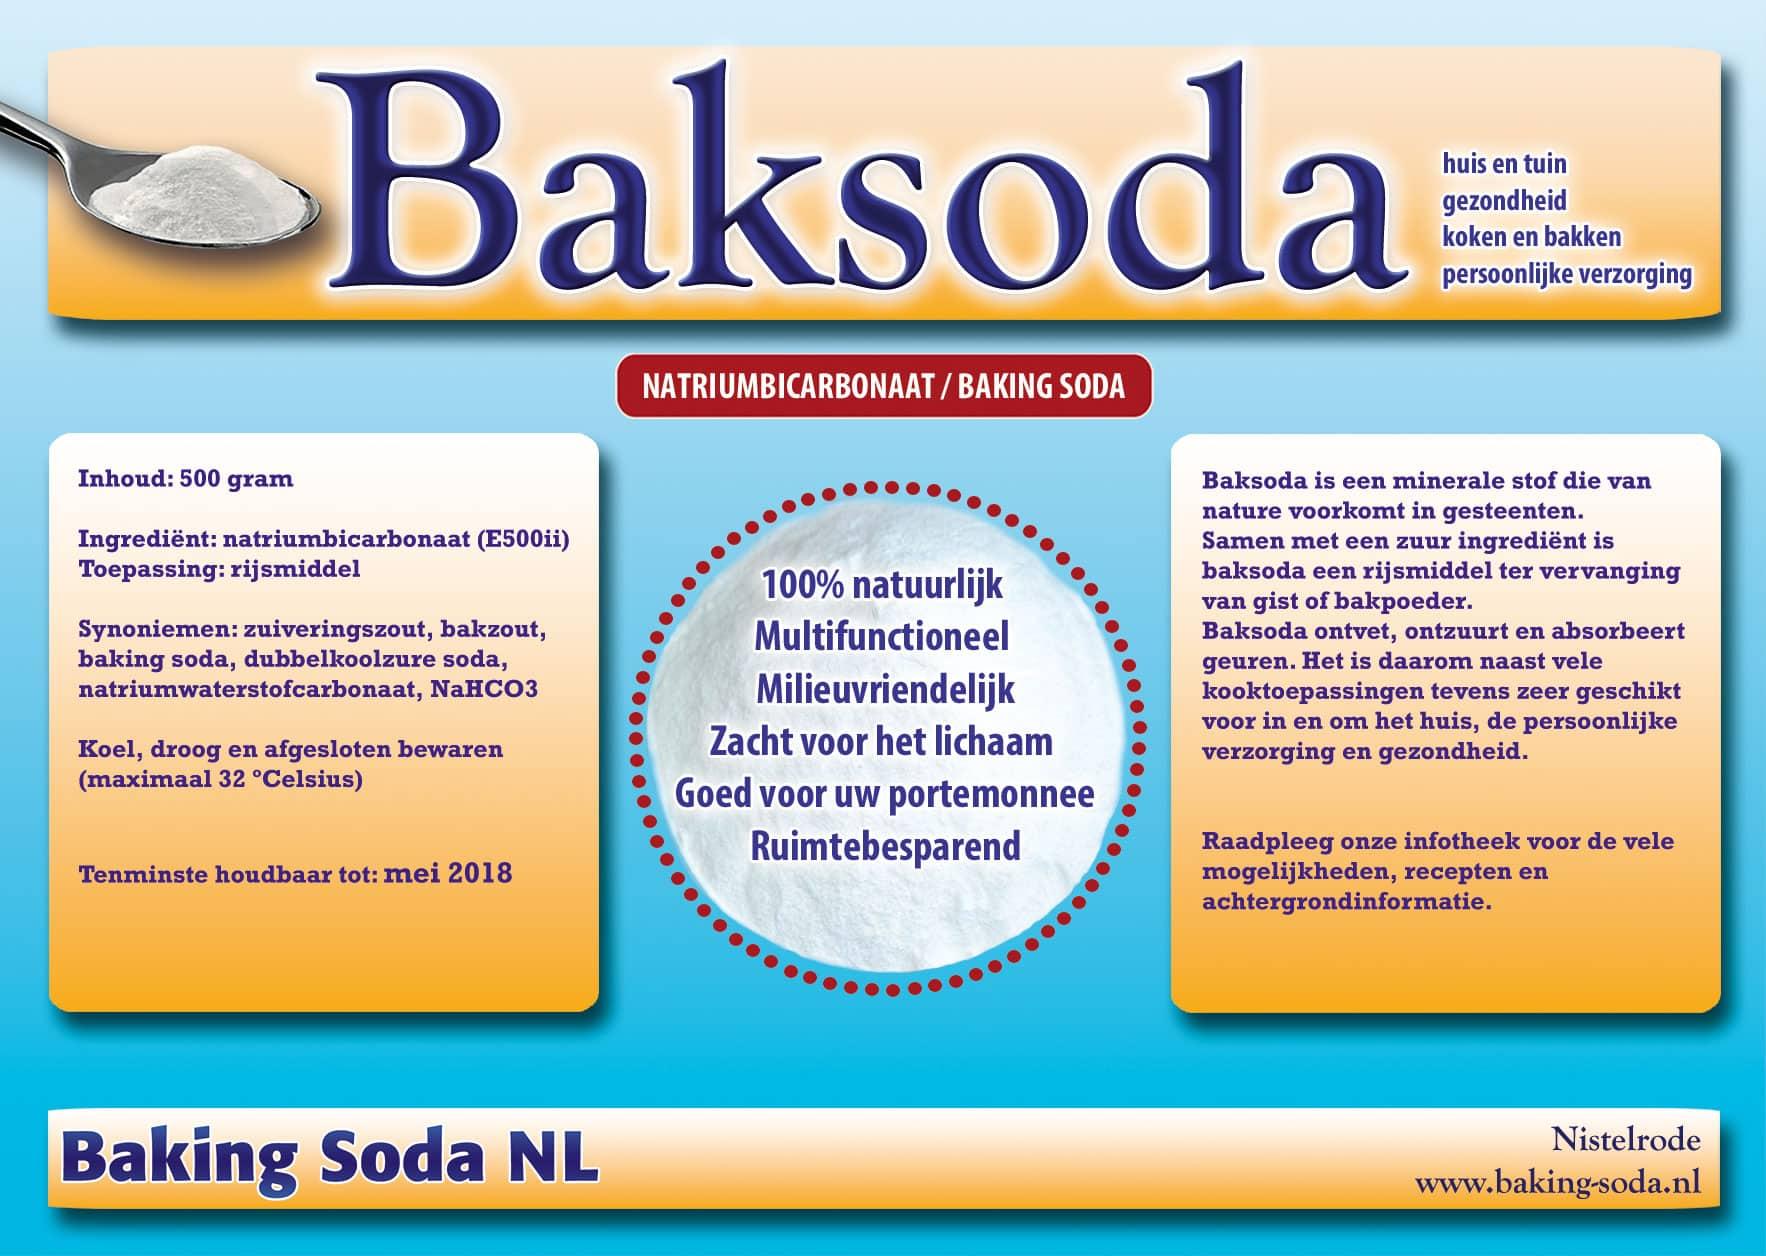 Baksoda - Baking Soda NL